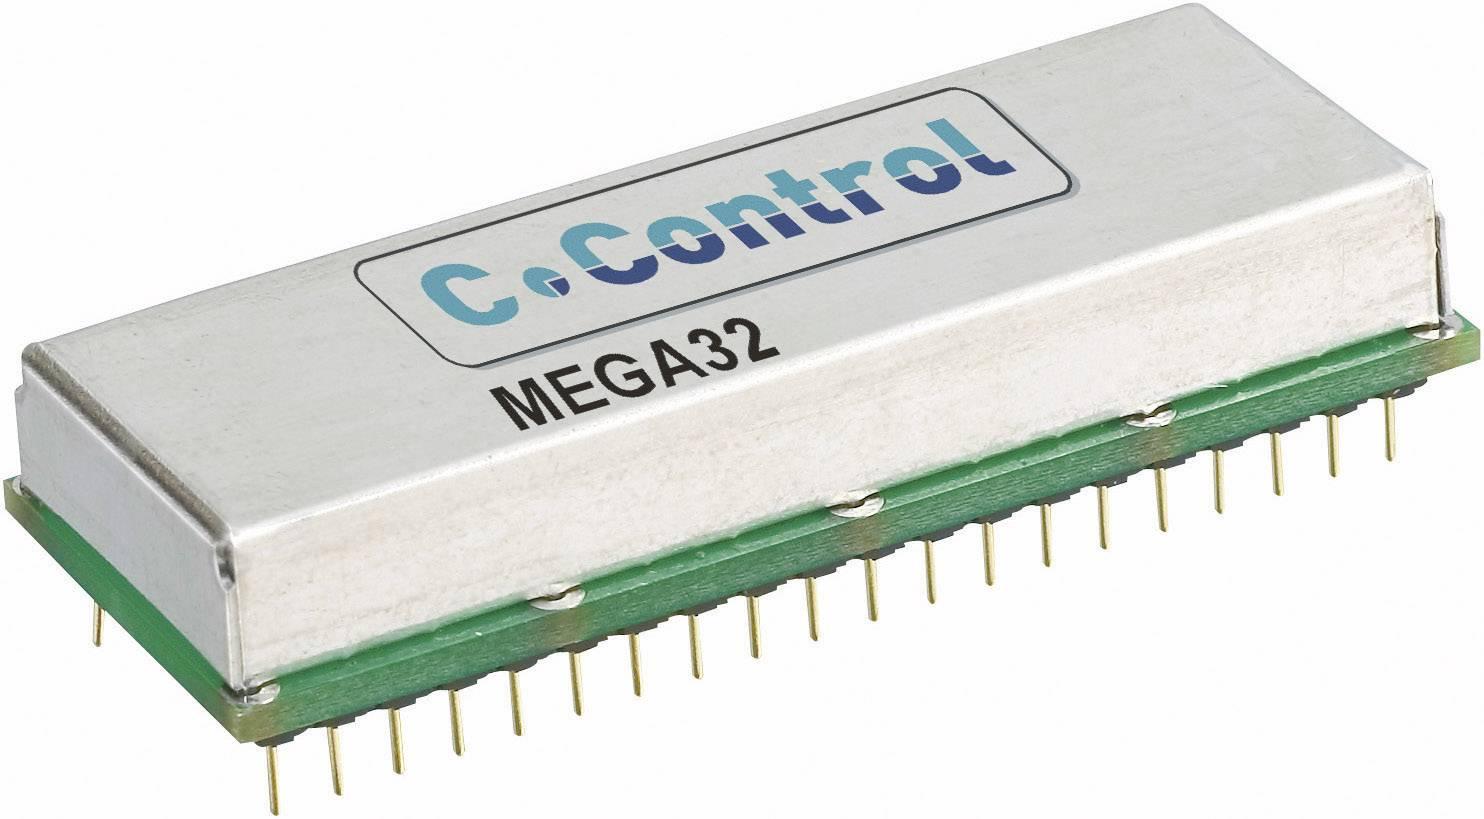 Automatizačnej systém C-Control